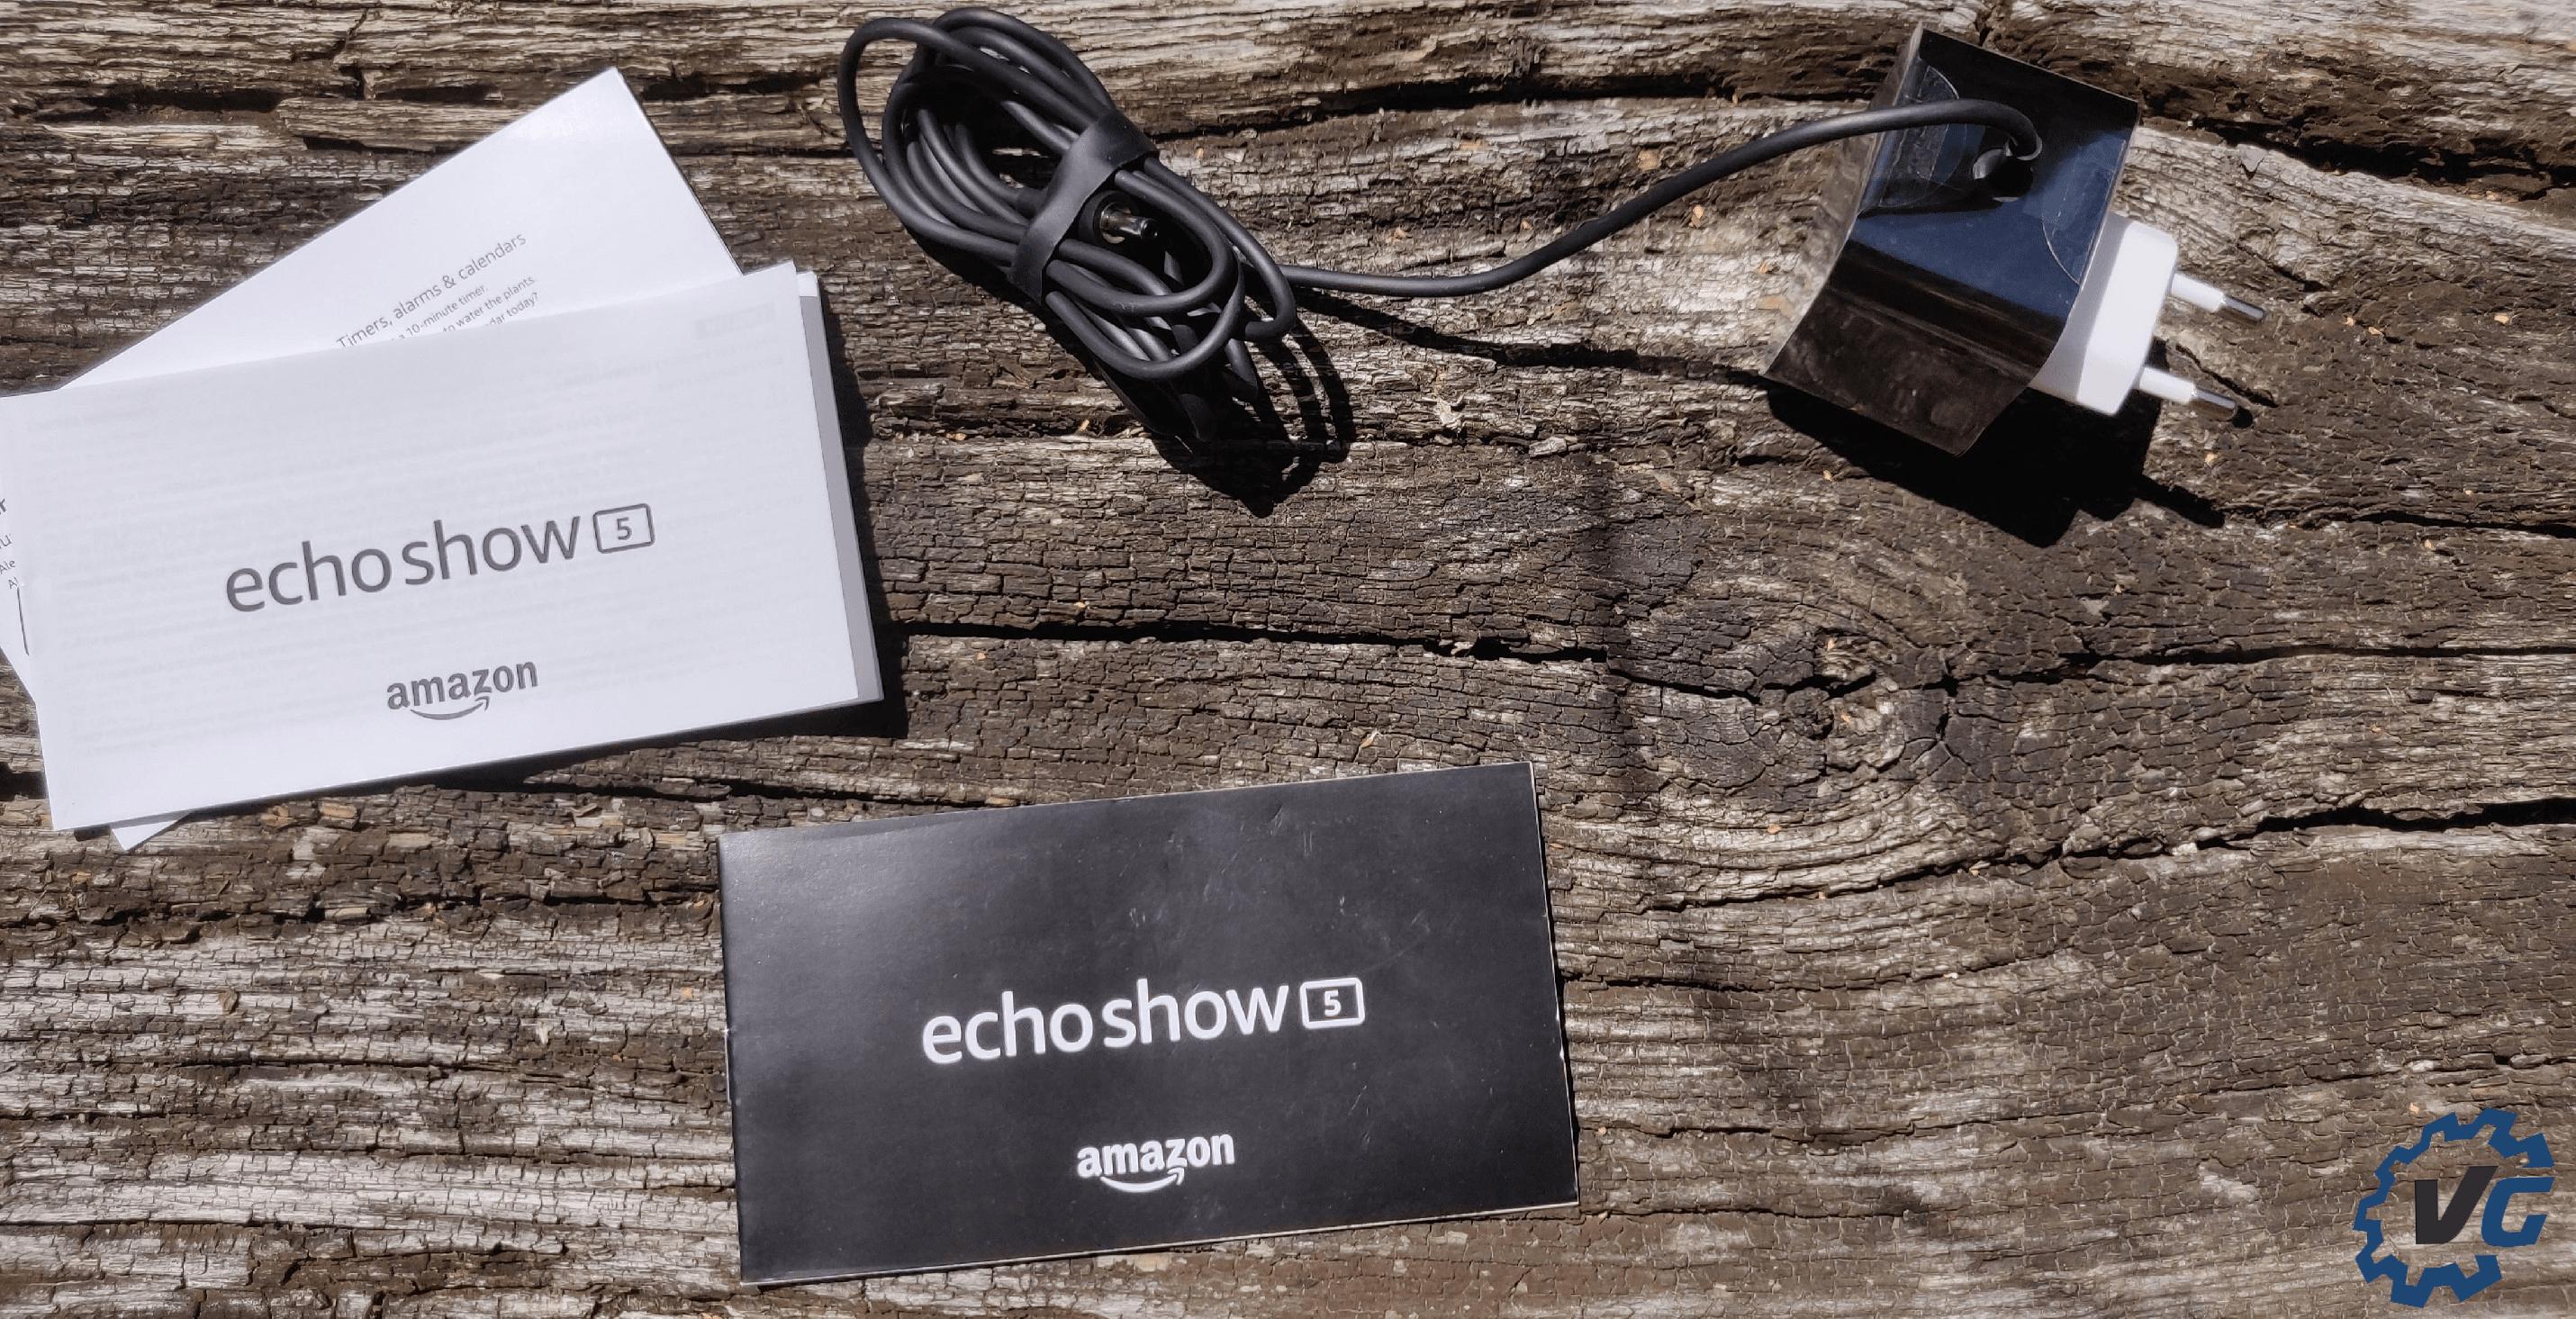 Echo show 5 contenu